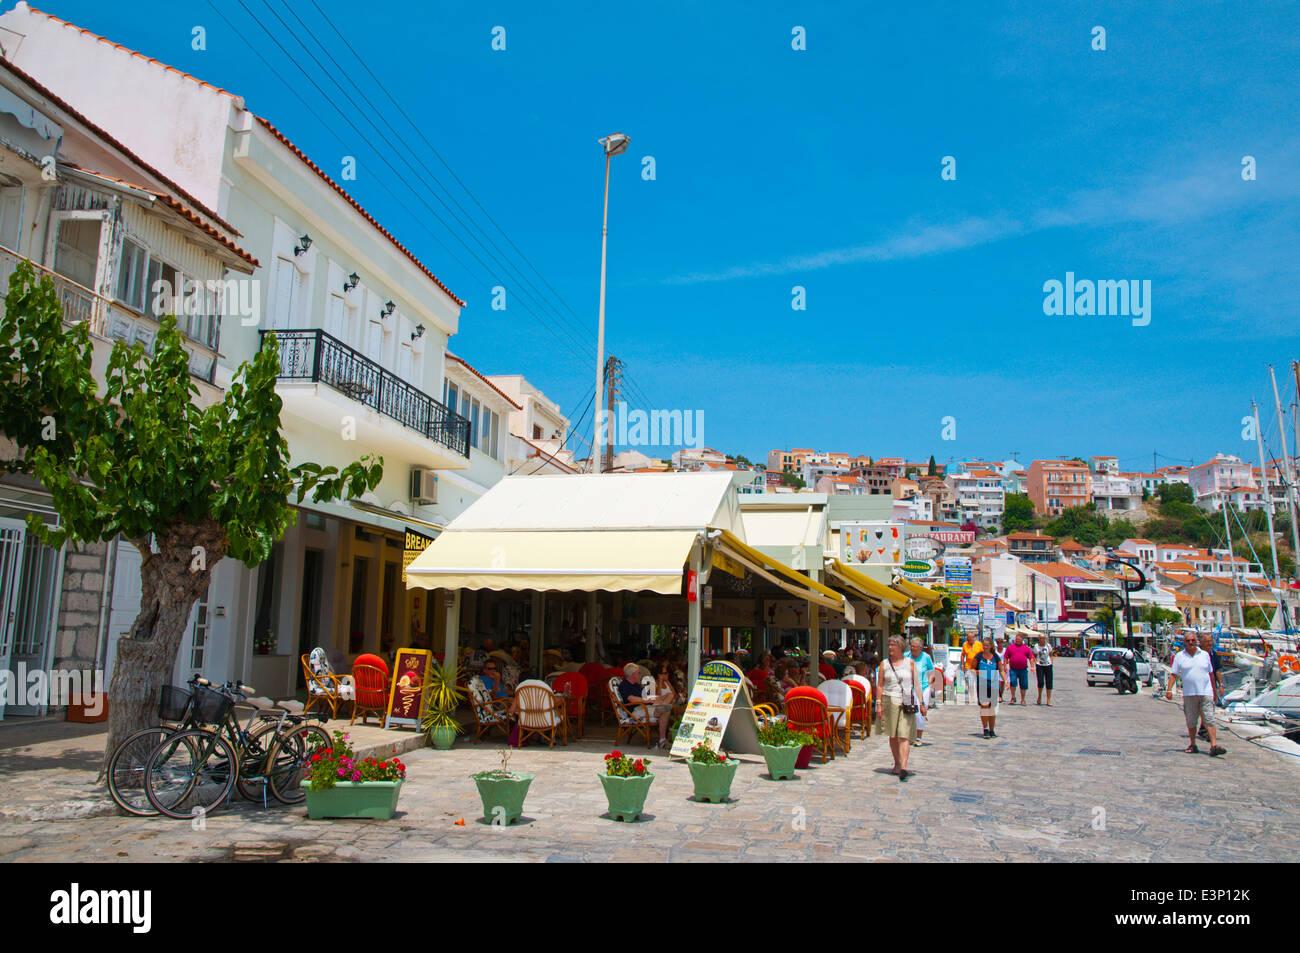 Seaside promenade, Pythagoreio, Samos, Aegean Sea, Greece, Europe Stock Photo